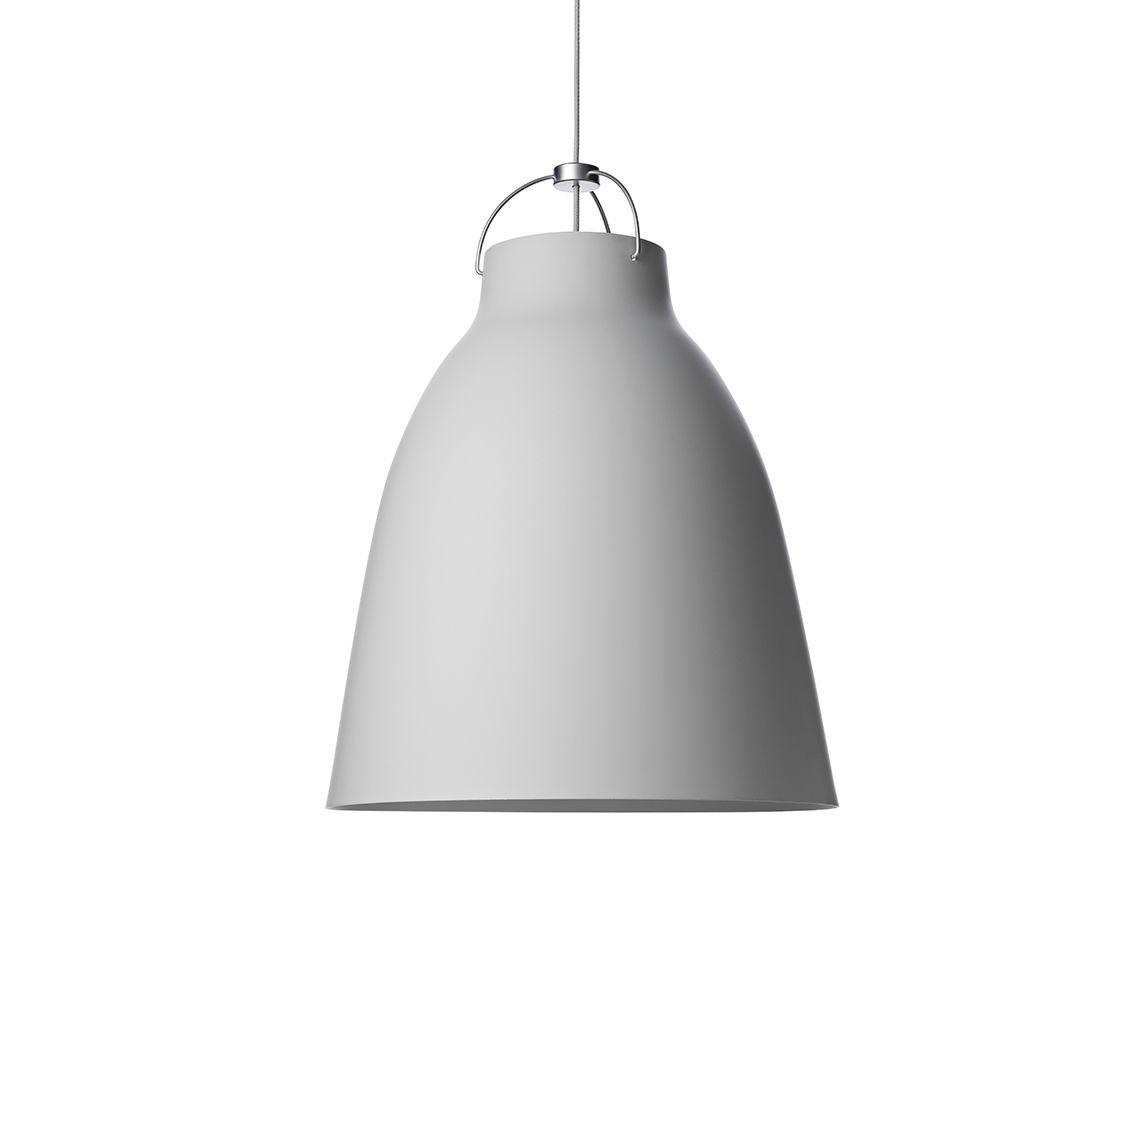 Caravaggio hanglamp Lightyears Ø16 mat grijs 25